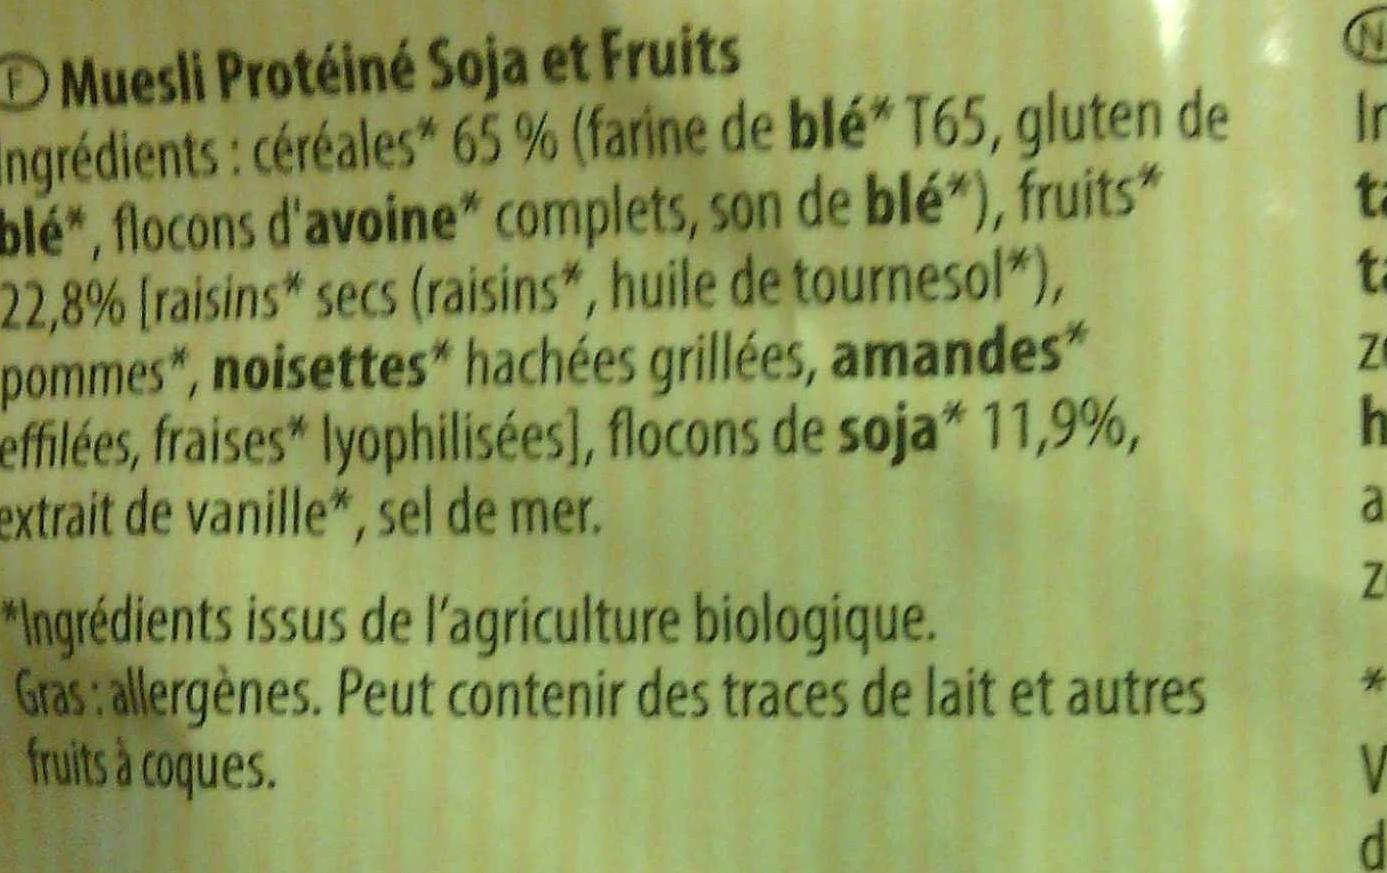 Joseph Favrichon Muesli Protéiné soja & fruits - Ingrediënten